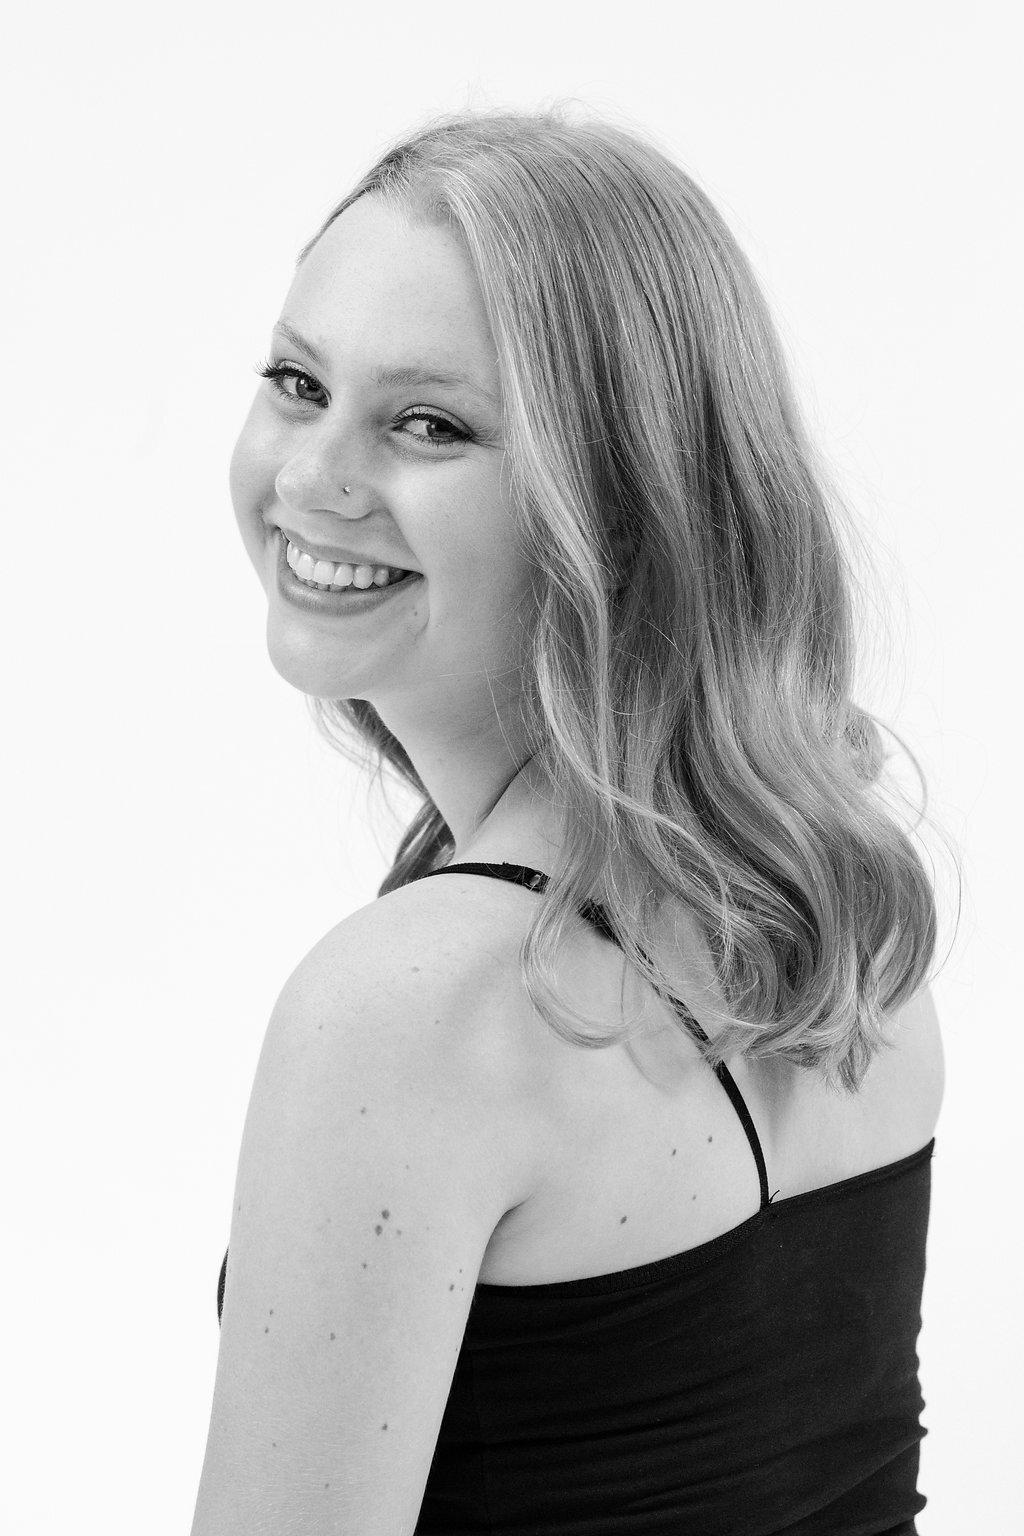 Linnea Drott-Assistant Choreographer and Technique Instructor  Linnea's Bio Coming Soon